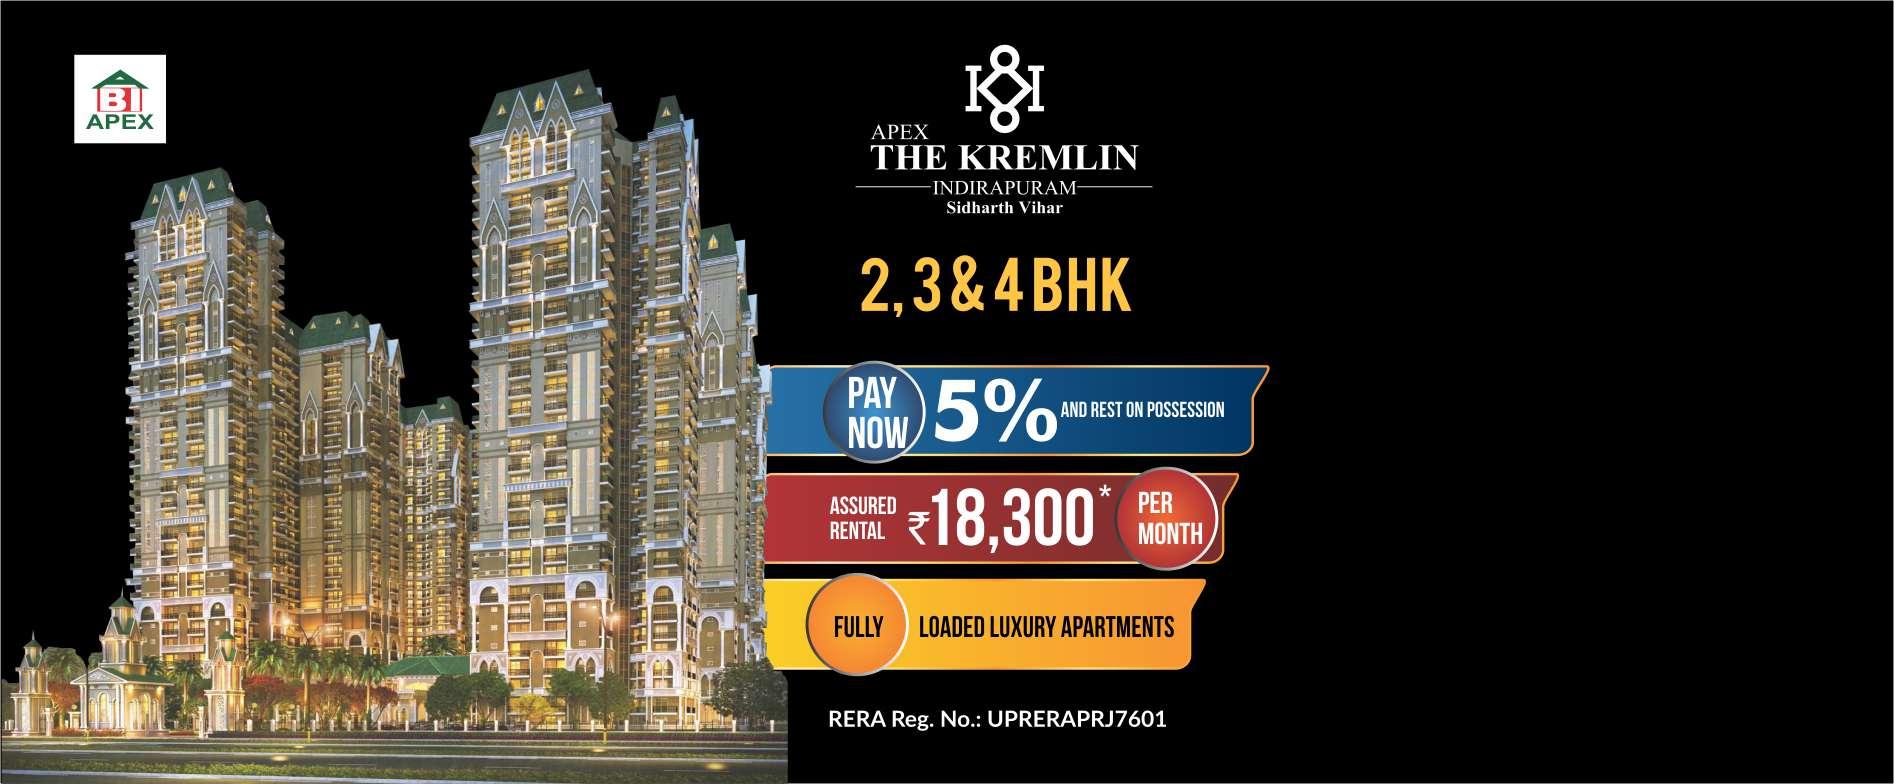 Apex The Kremlin Indrapuram for booking call us: +918010654321